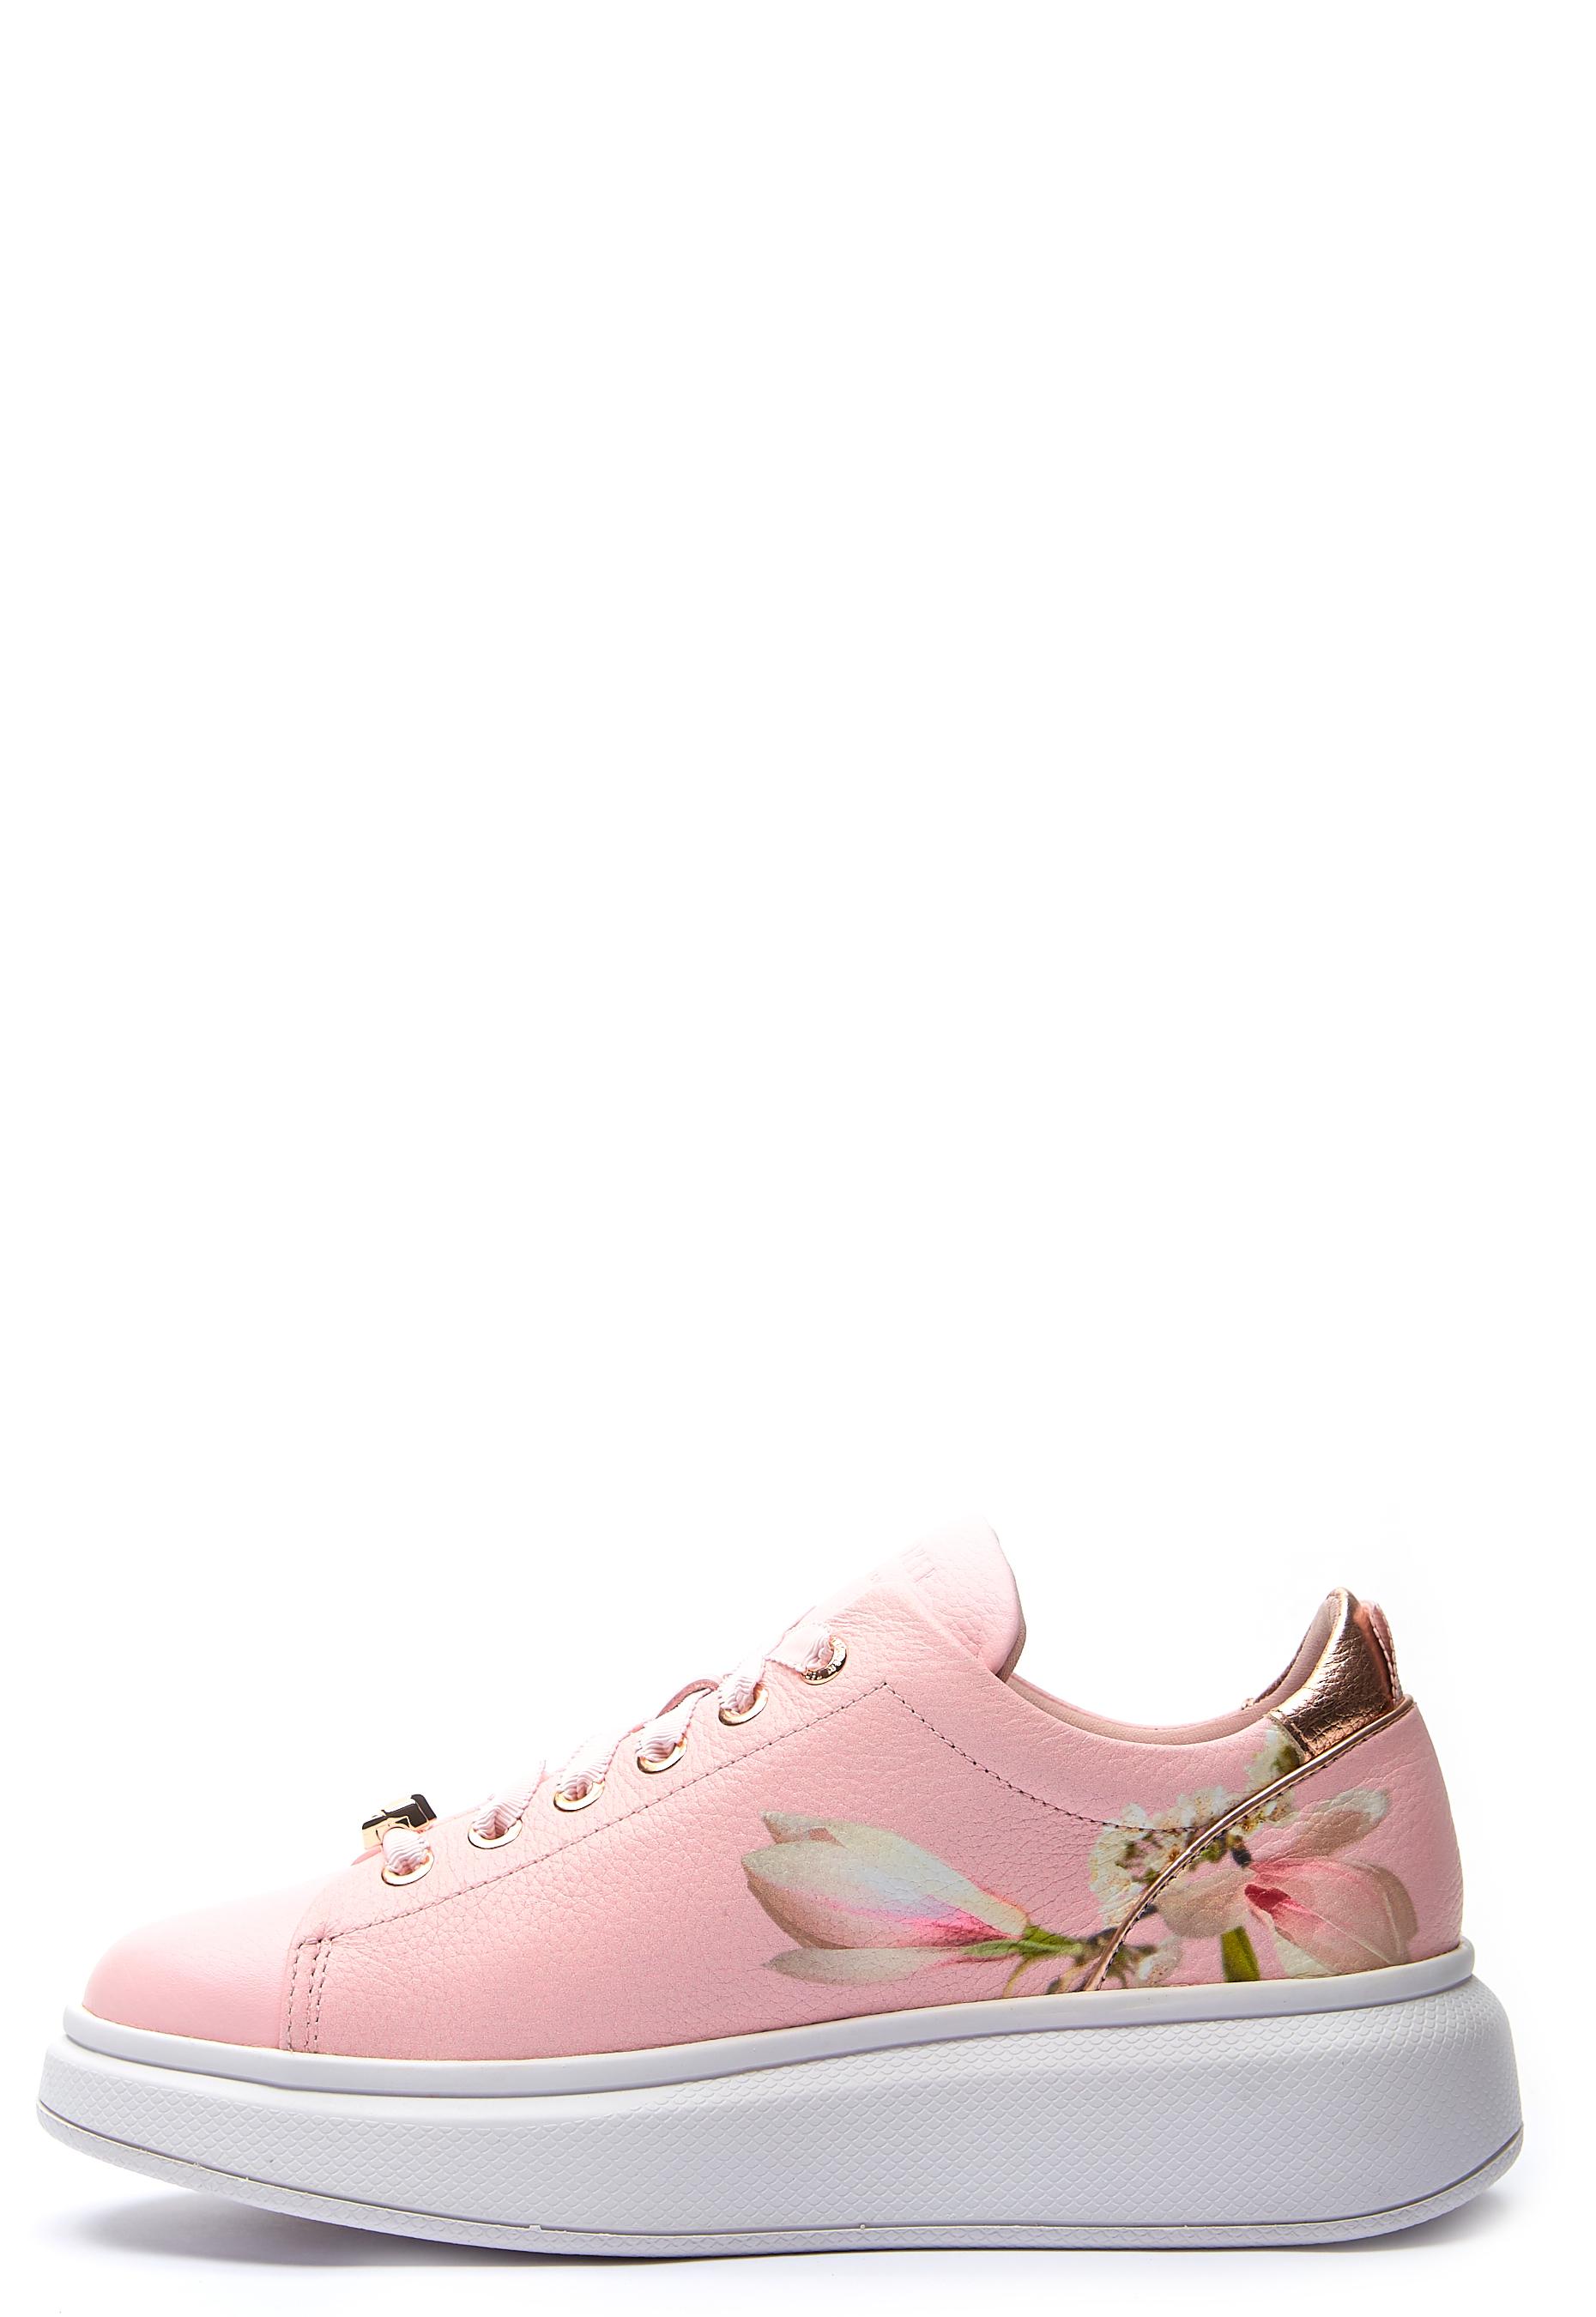 125d929db0cd9b Ted Baker Ailbe Shoes Blossom Harmony - Bubbleroom